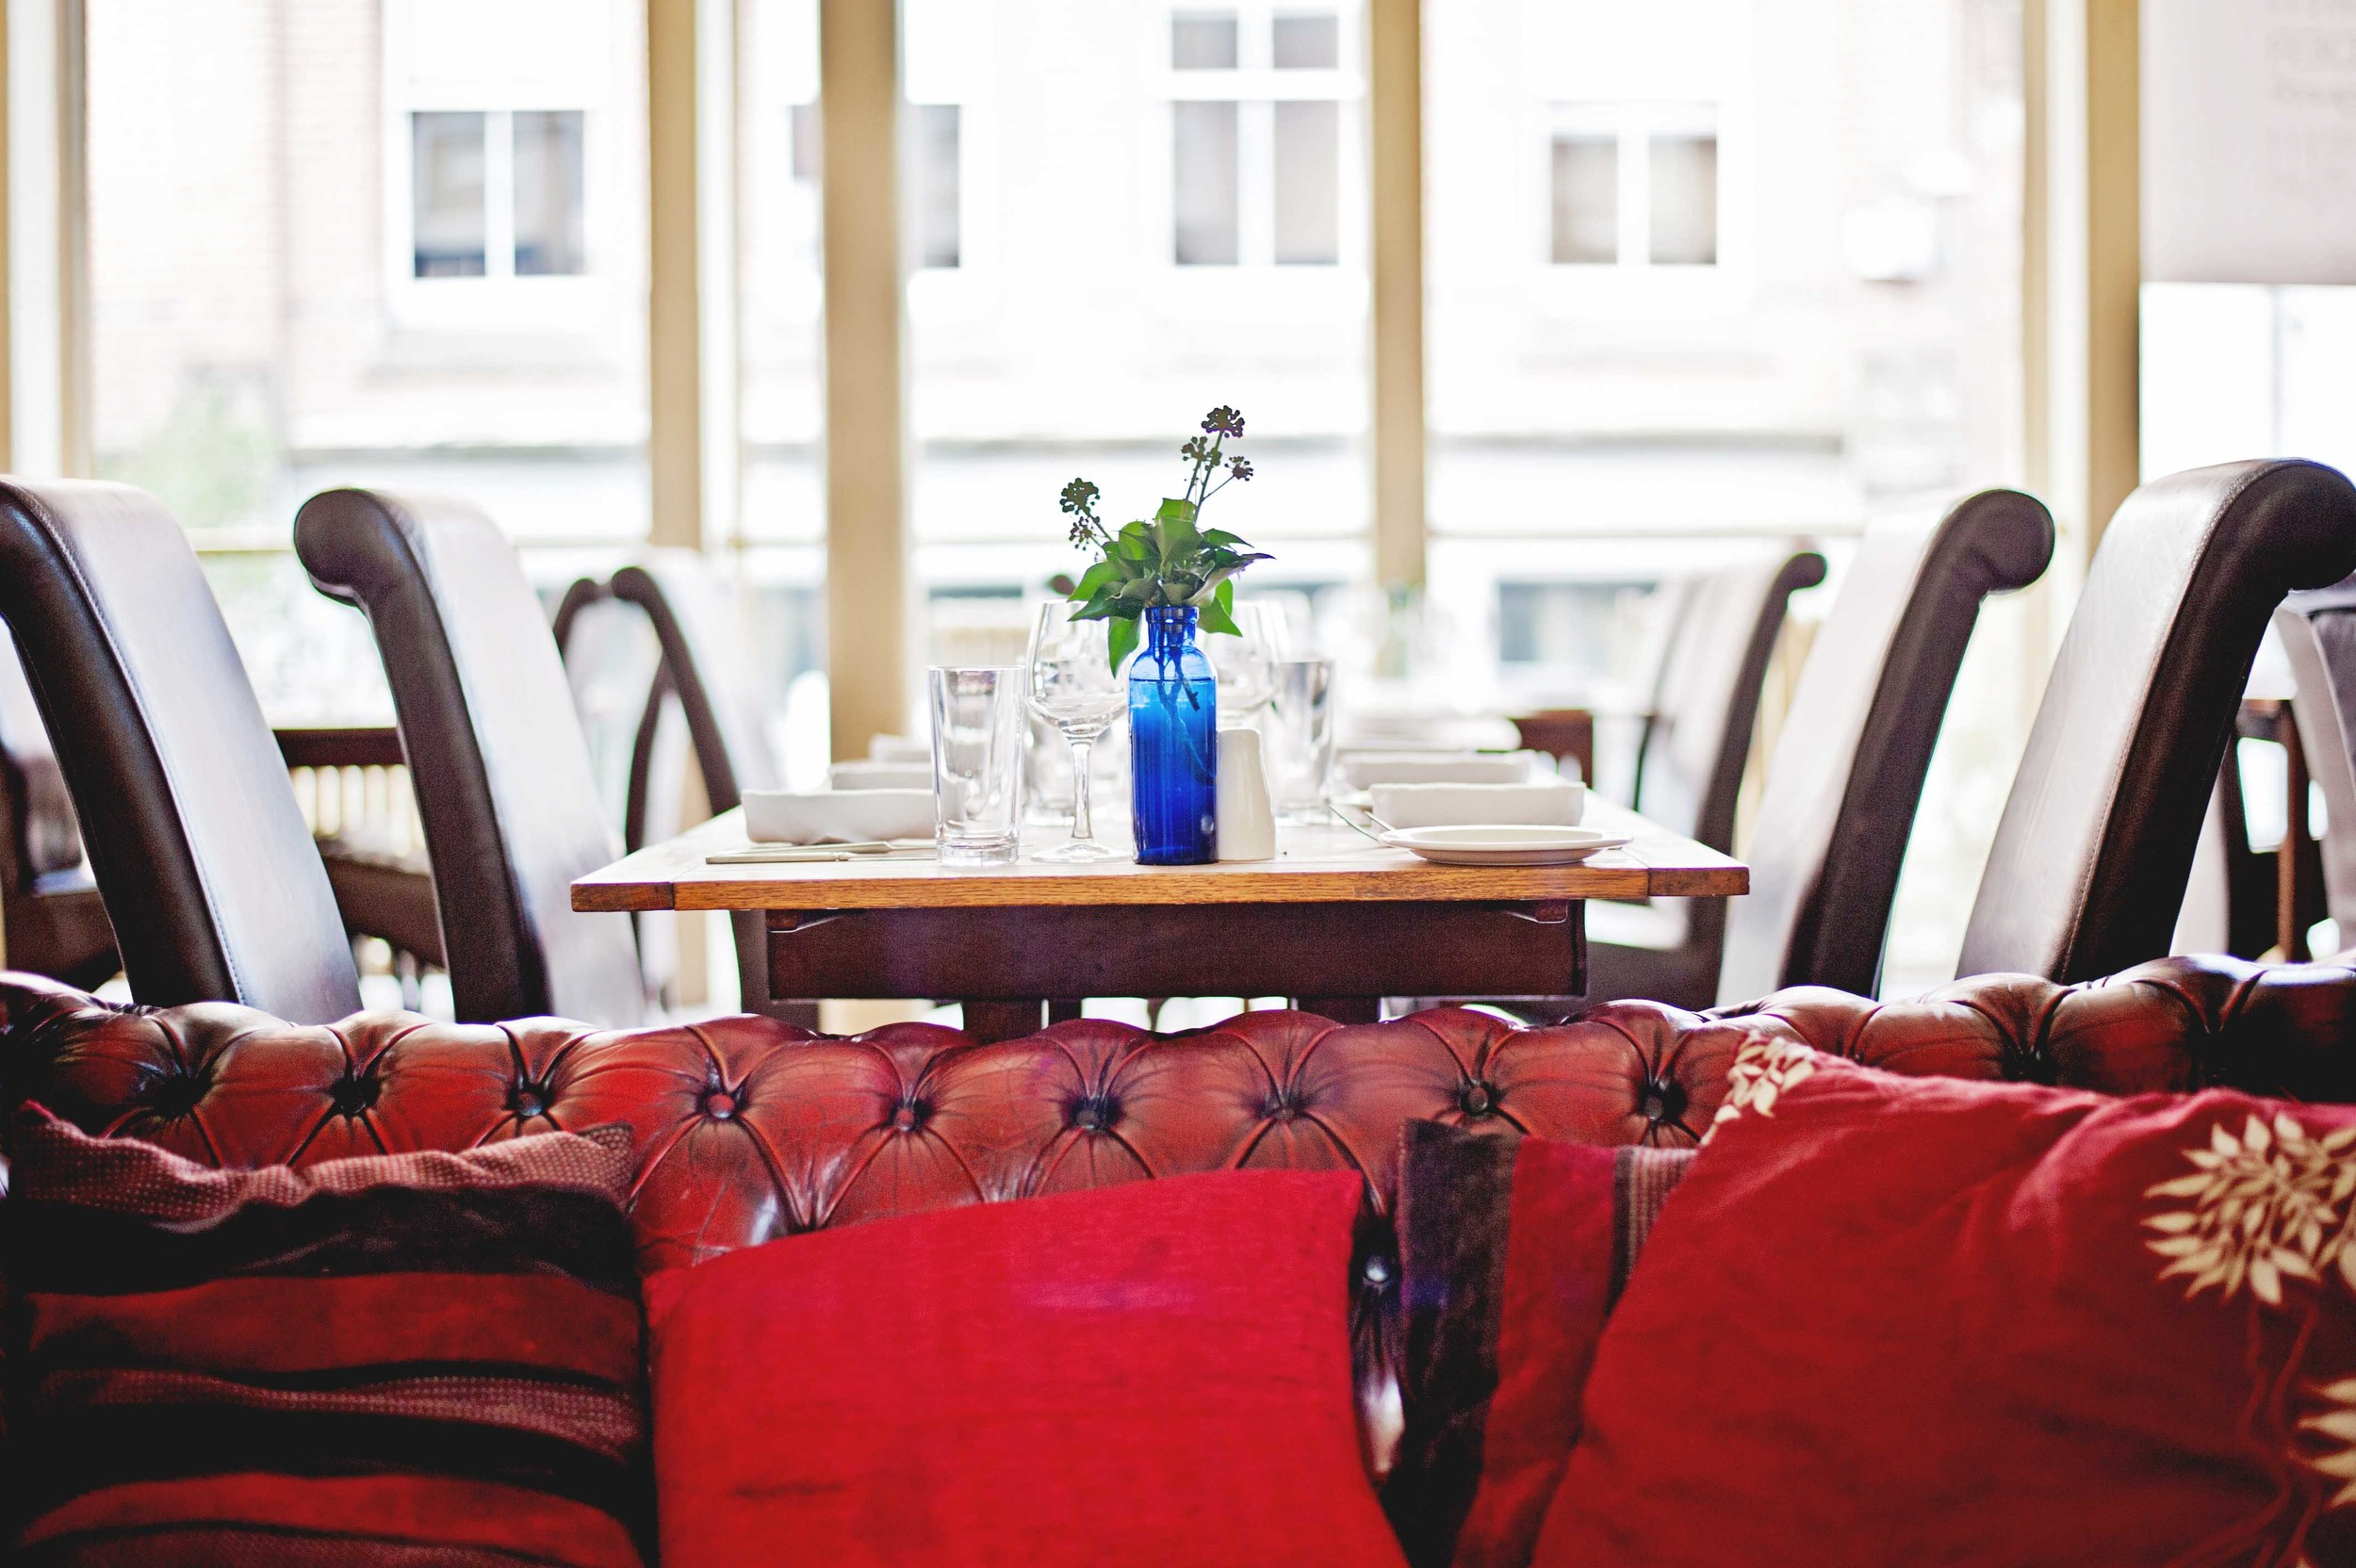 Graduation restaurant nottingham